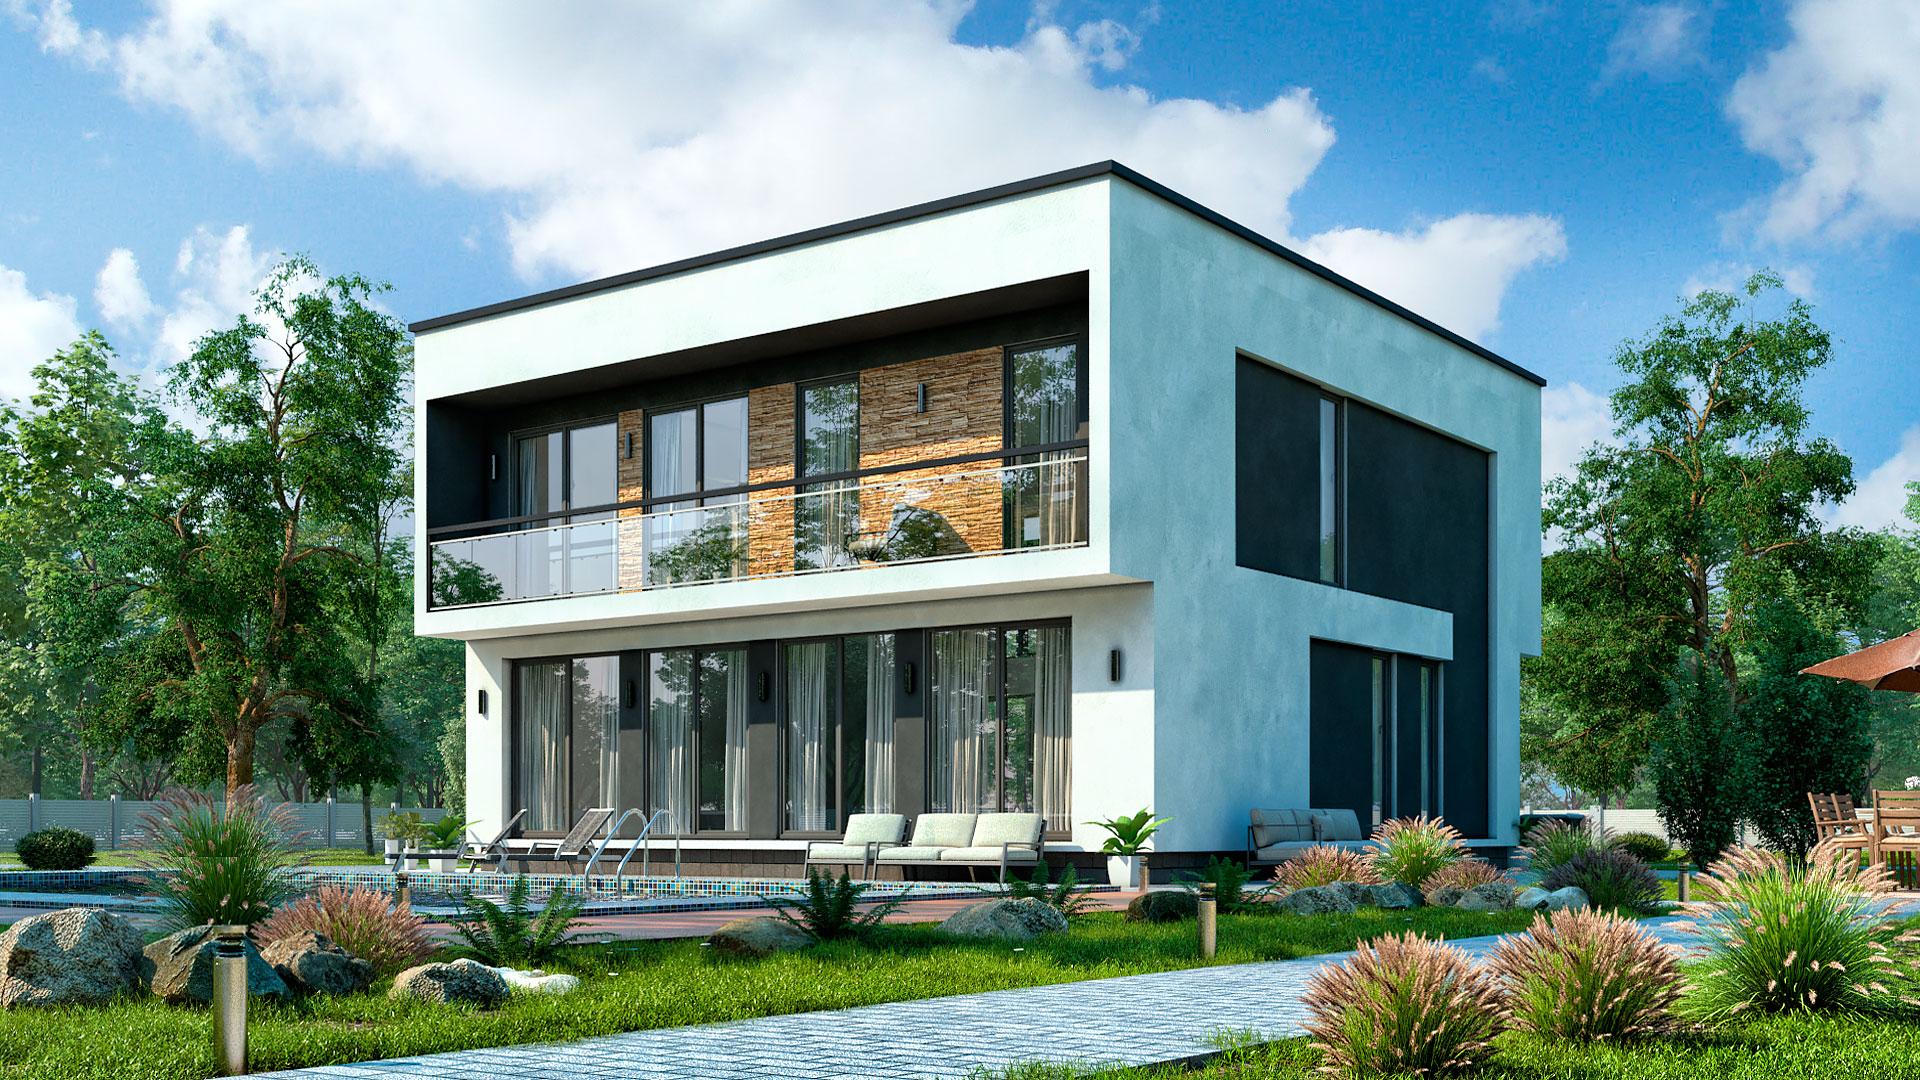 Передний фасад двухэтажного дома со вторым светом, проект БЭНПАН БП-224.